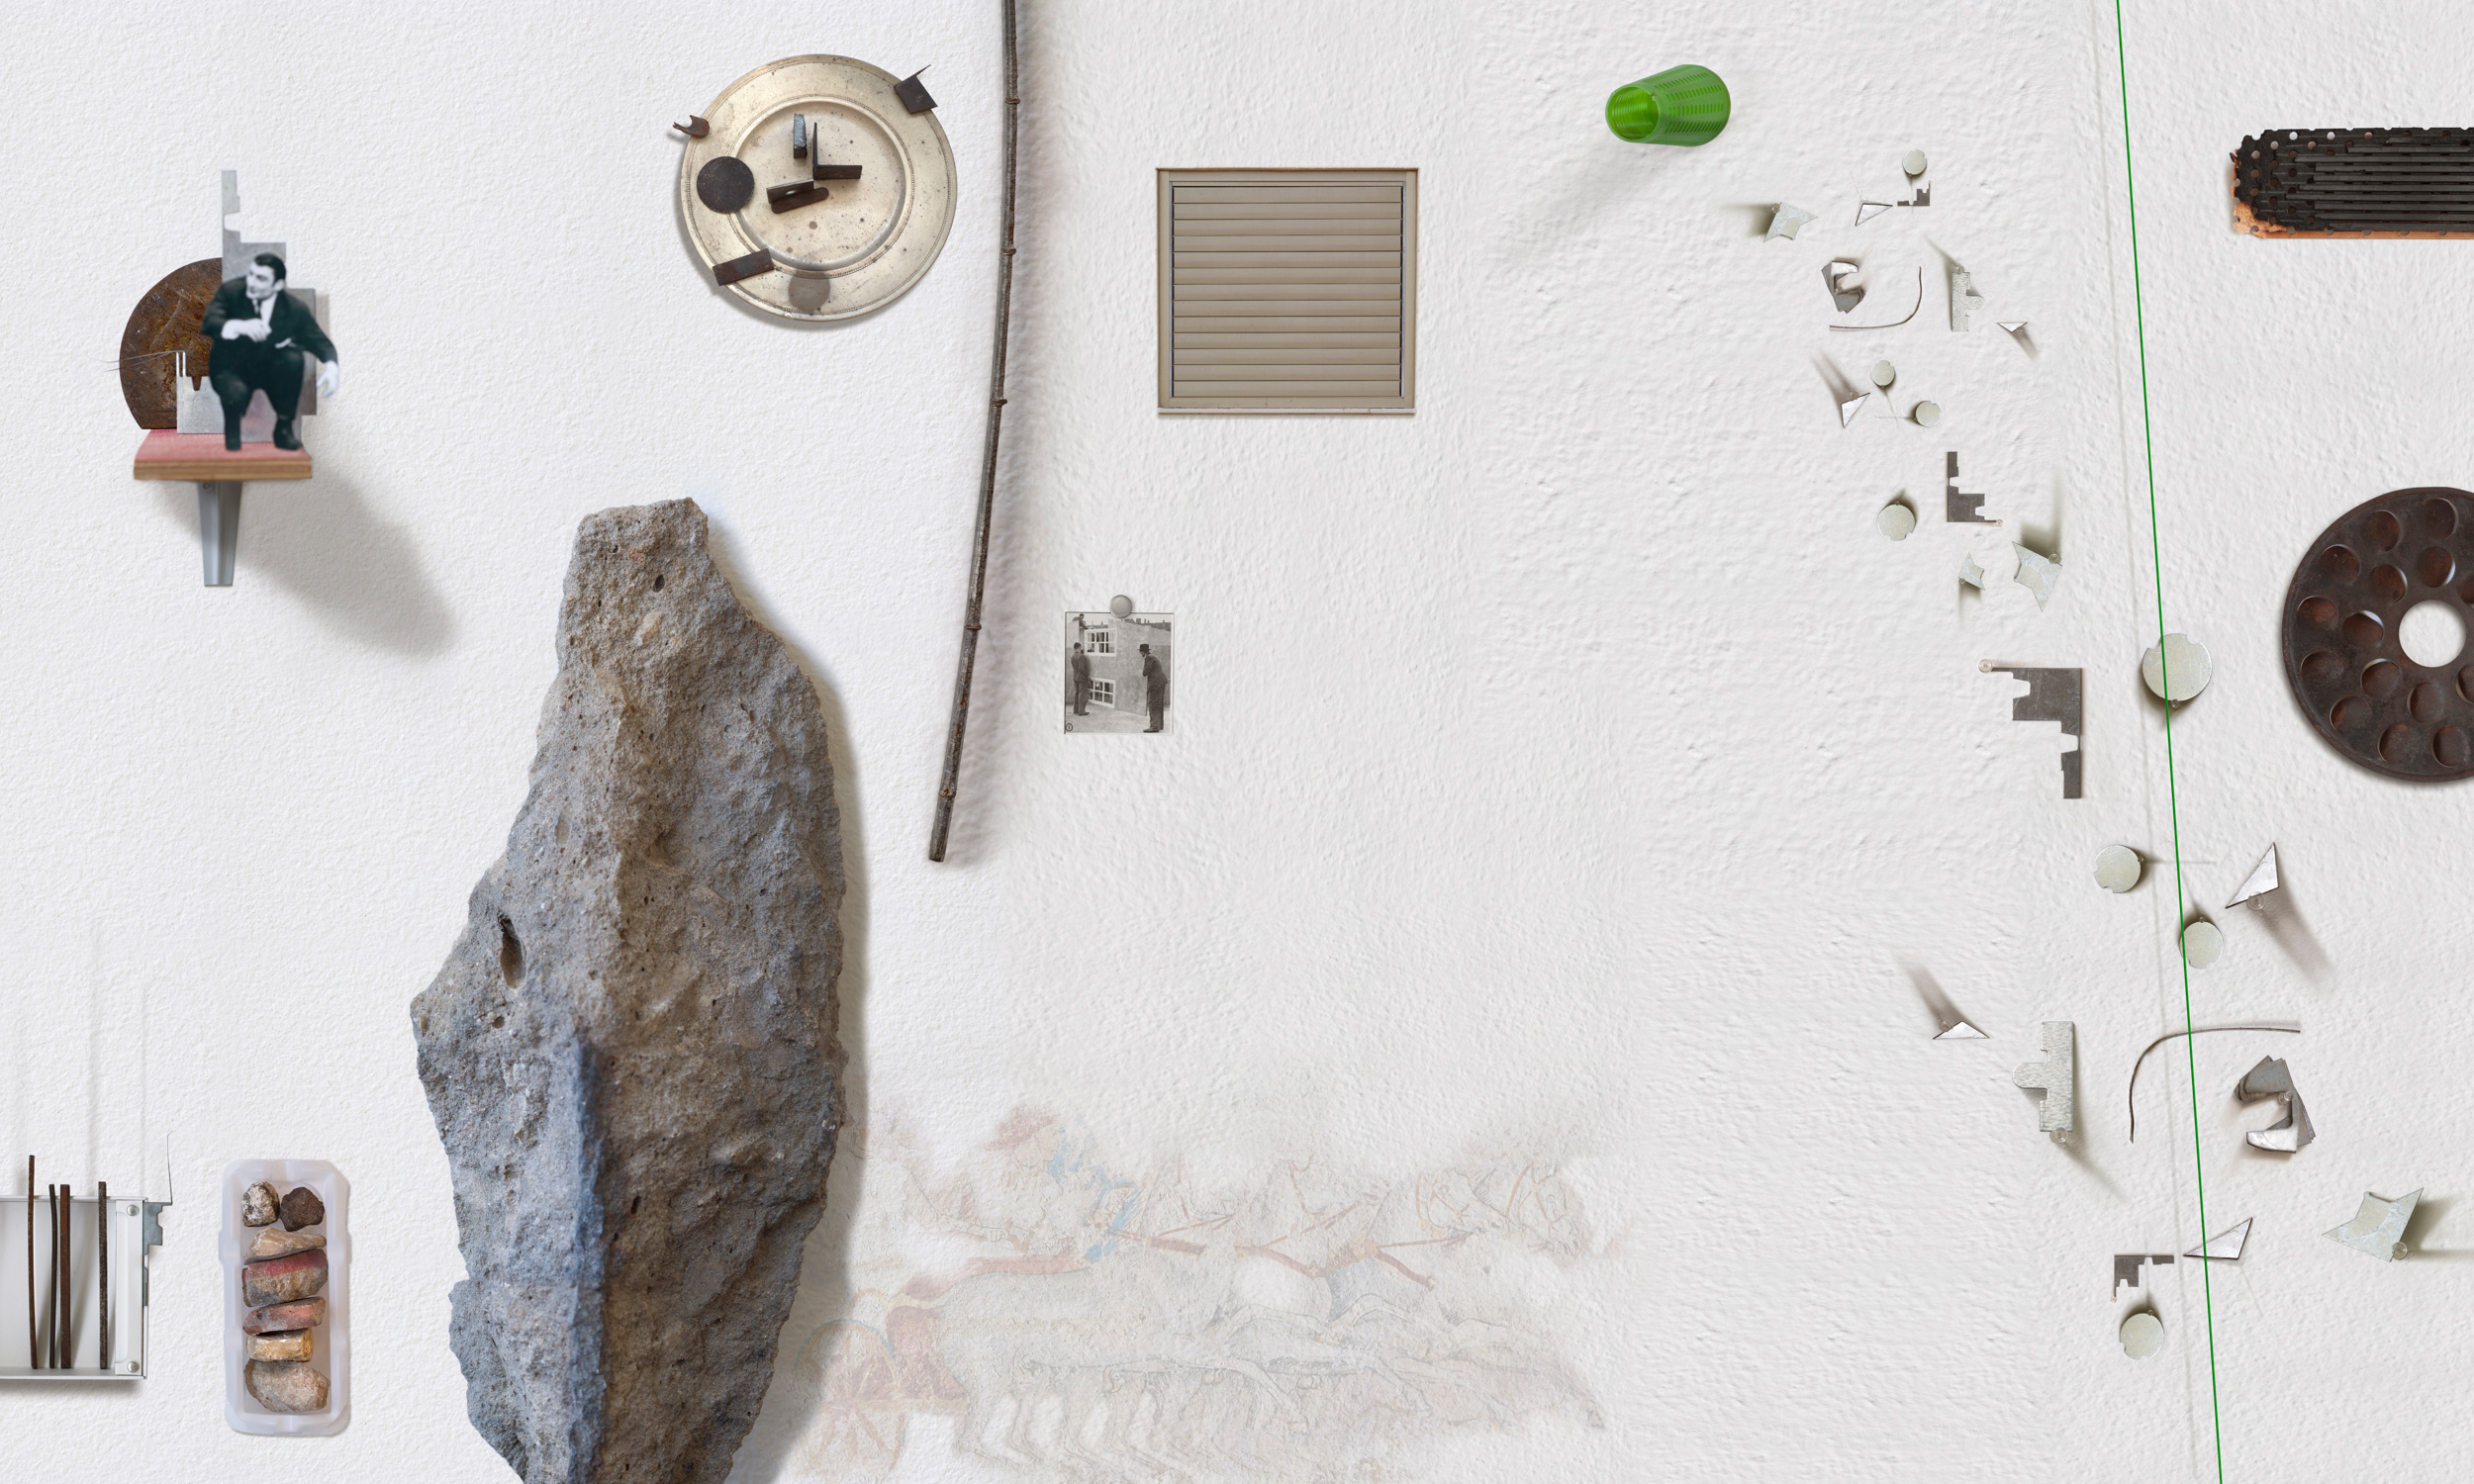 Ilit Azoulay, Room #8, detail